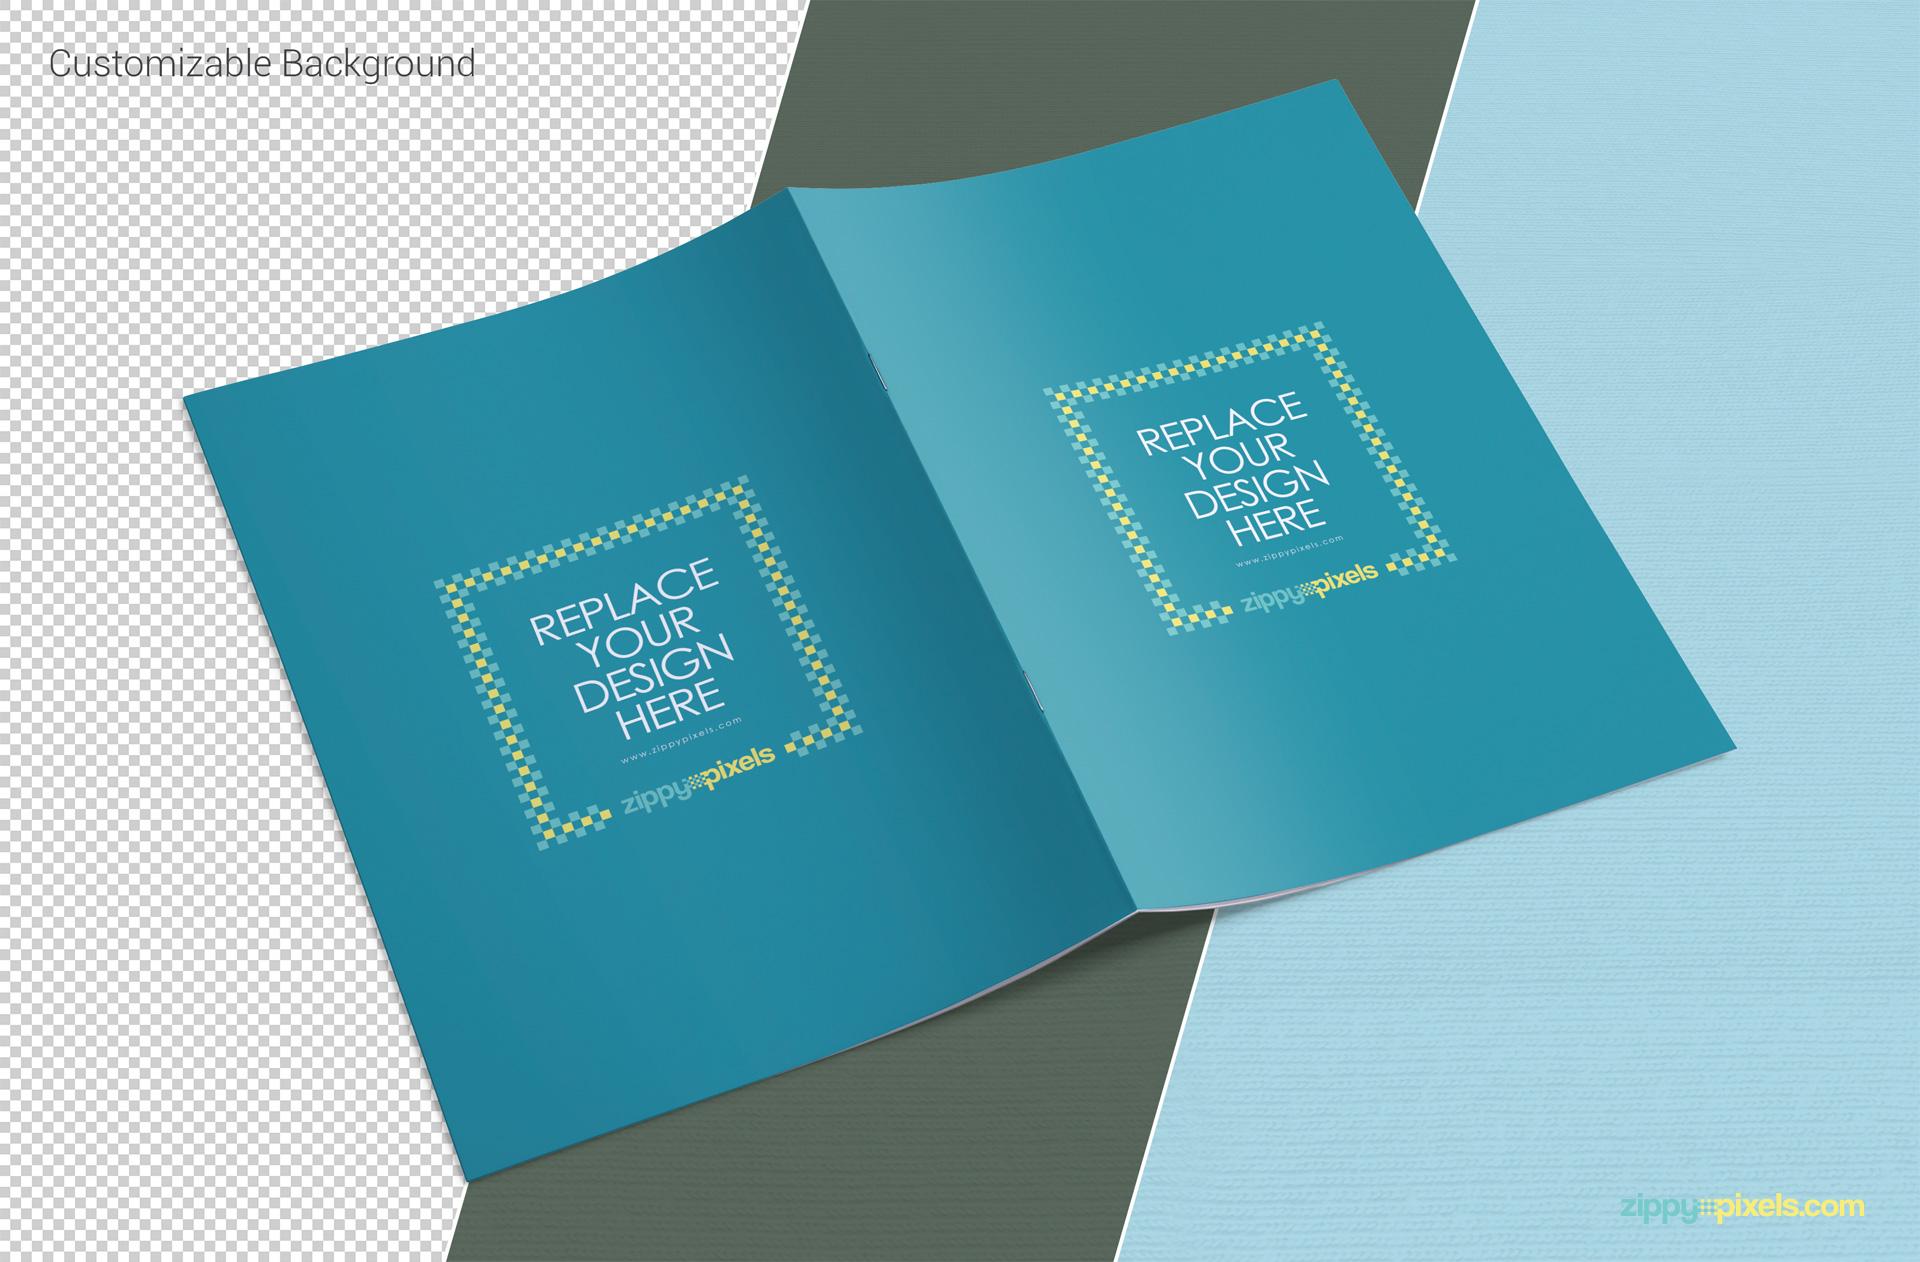 09-free-psd-bi-fold-brochure-design-824x542